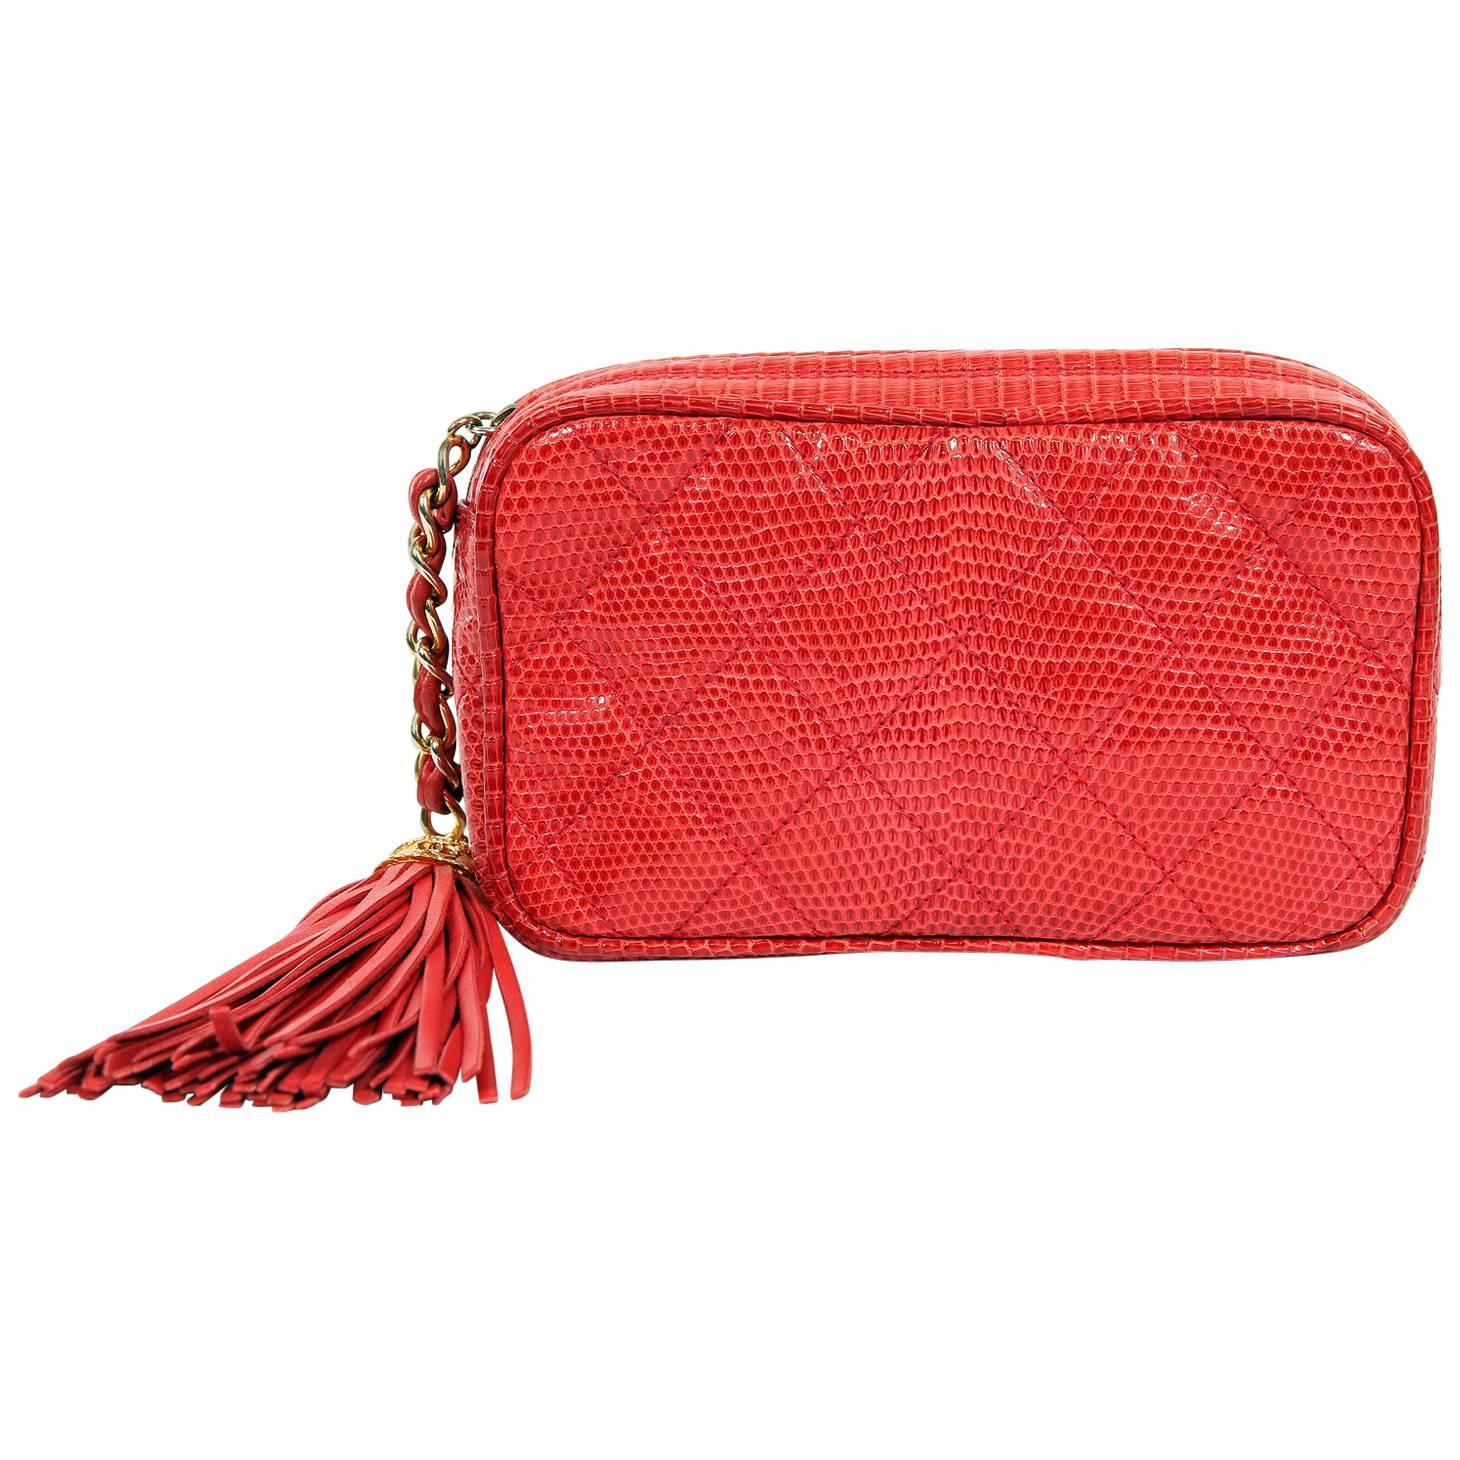 Chanel Red Lizard Vintage Tassel Clutch